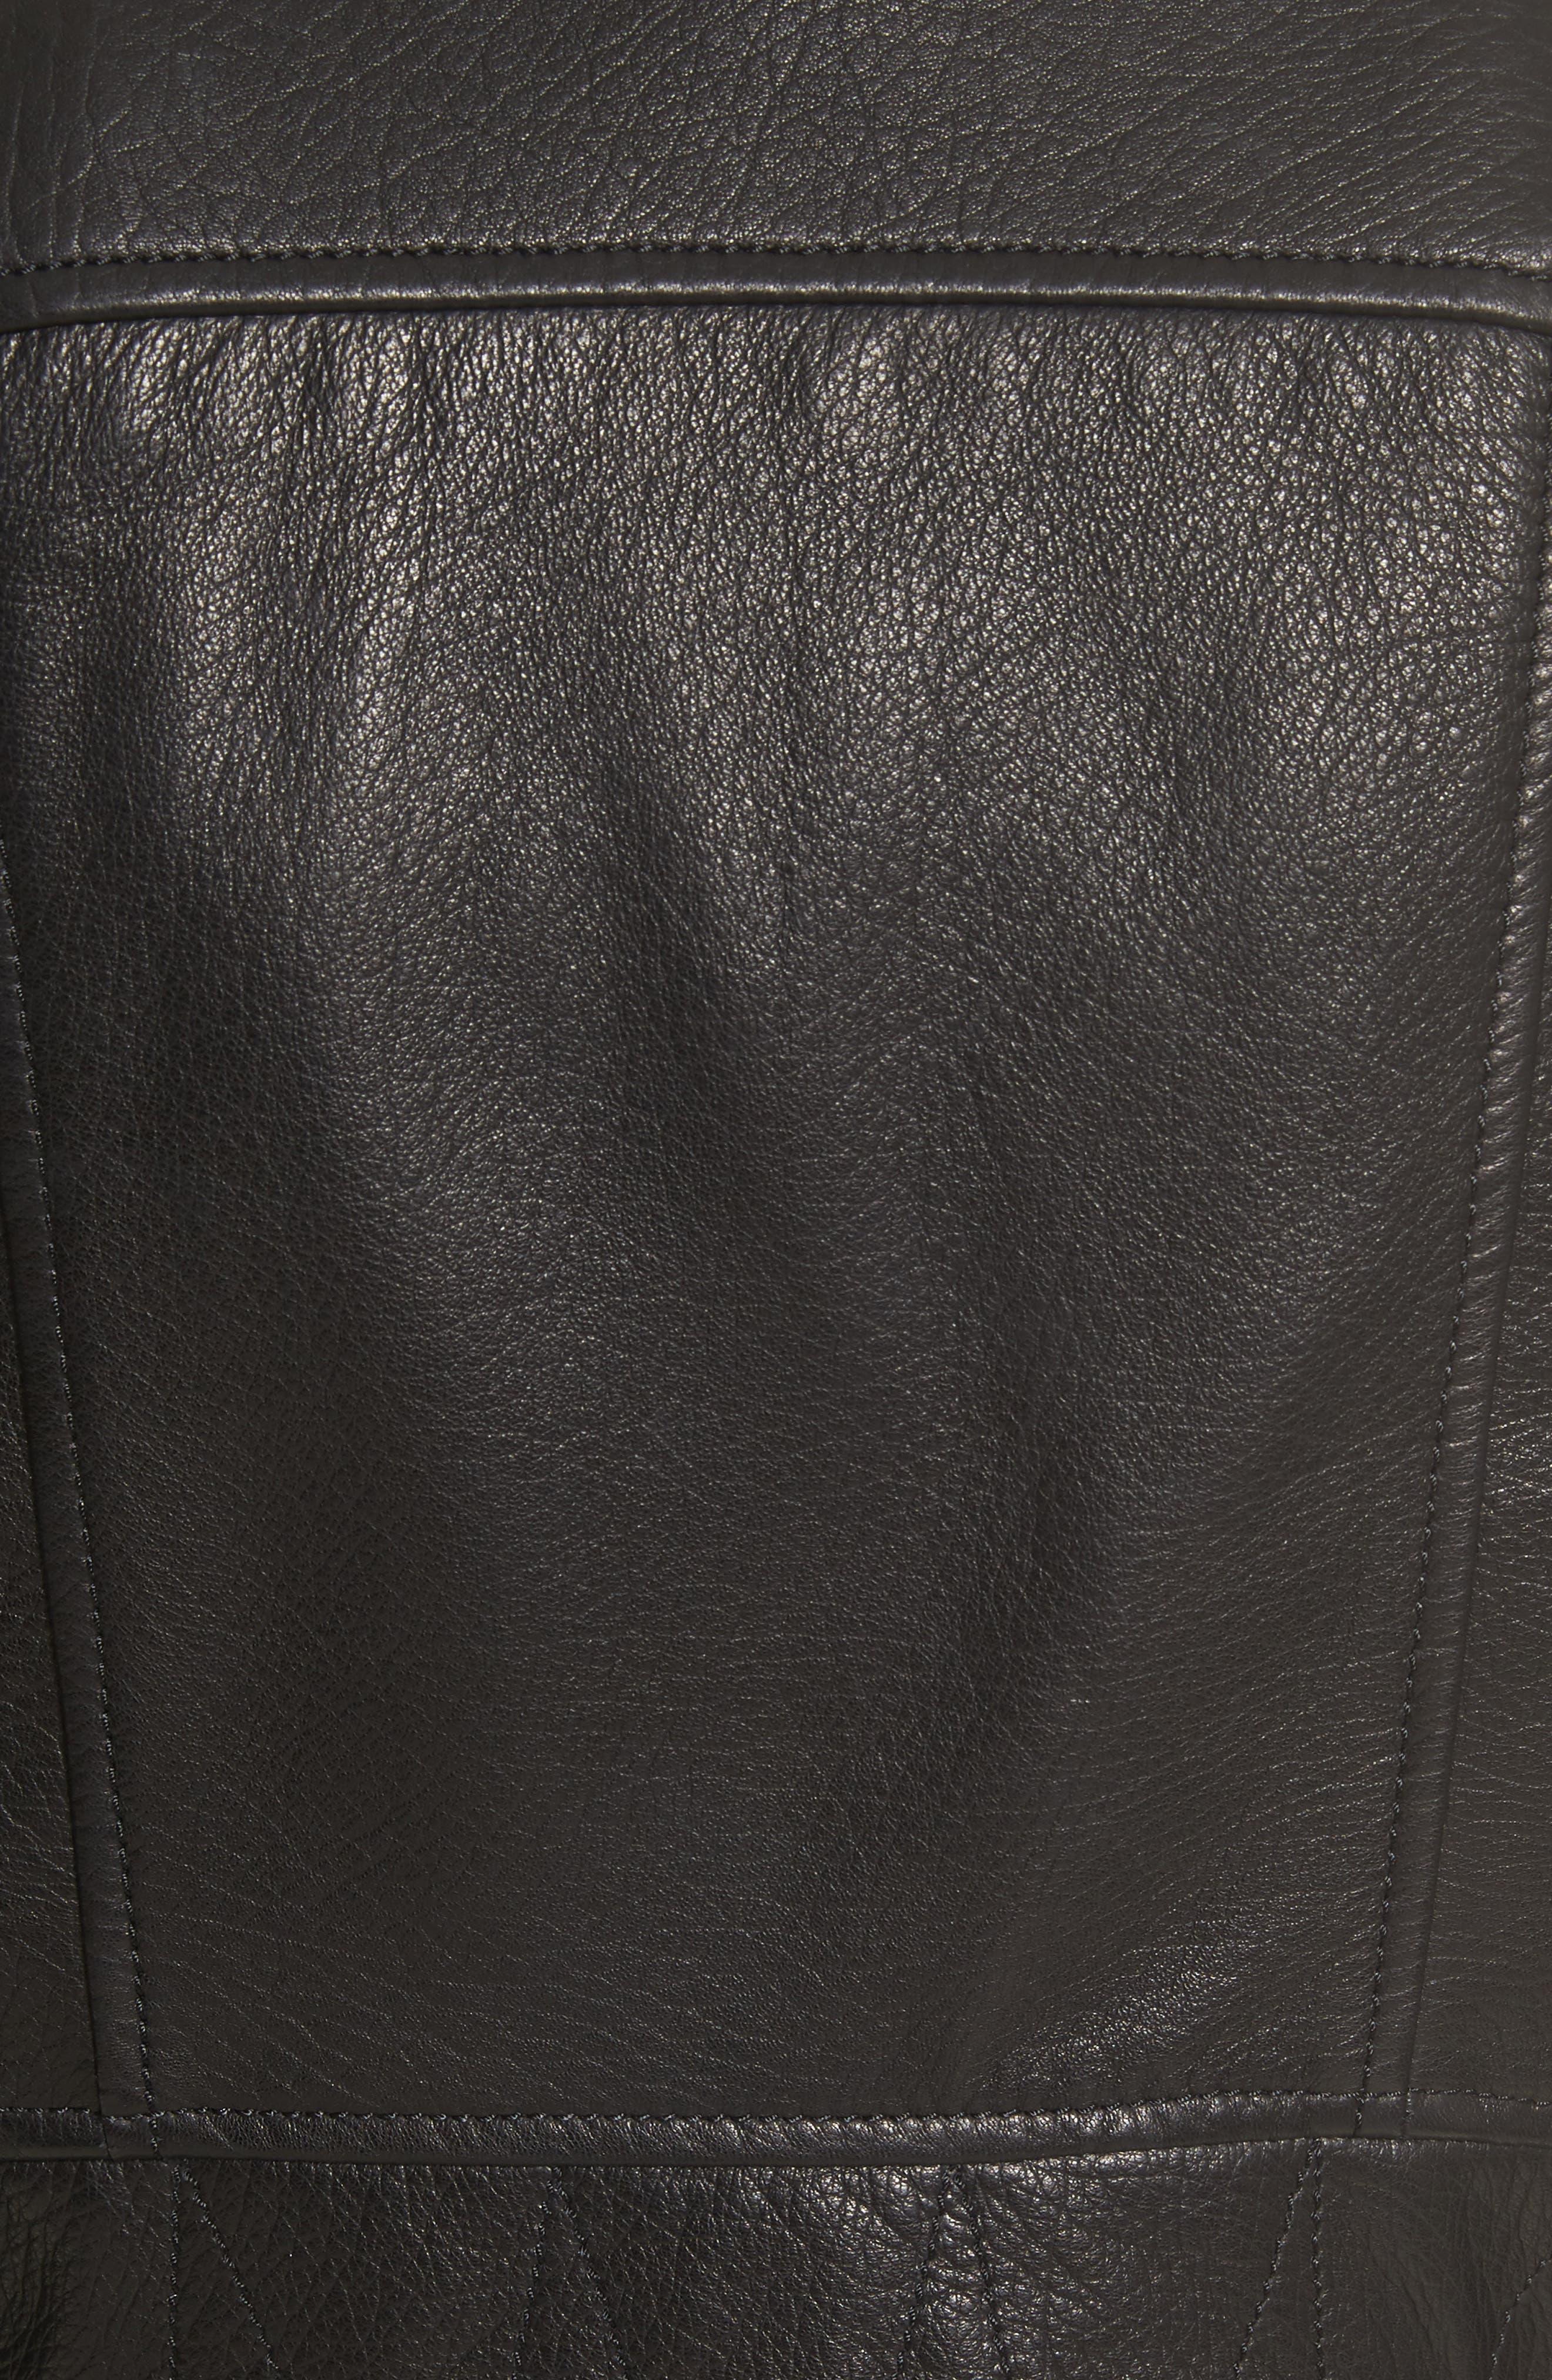 Lace-Up Lambskin Leather Jacket,                             Alternate thumbnail 6, color,                             Black